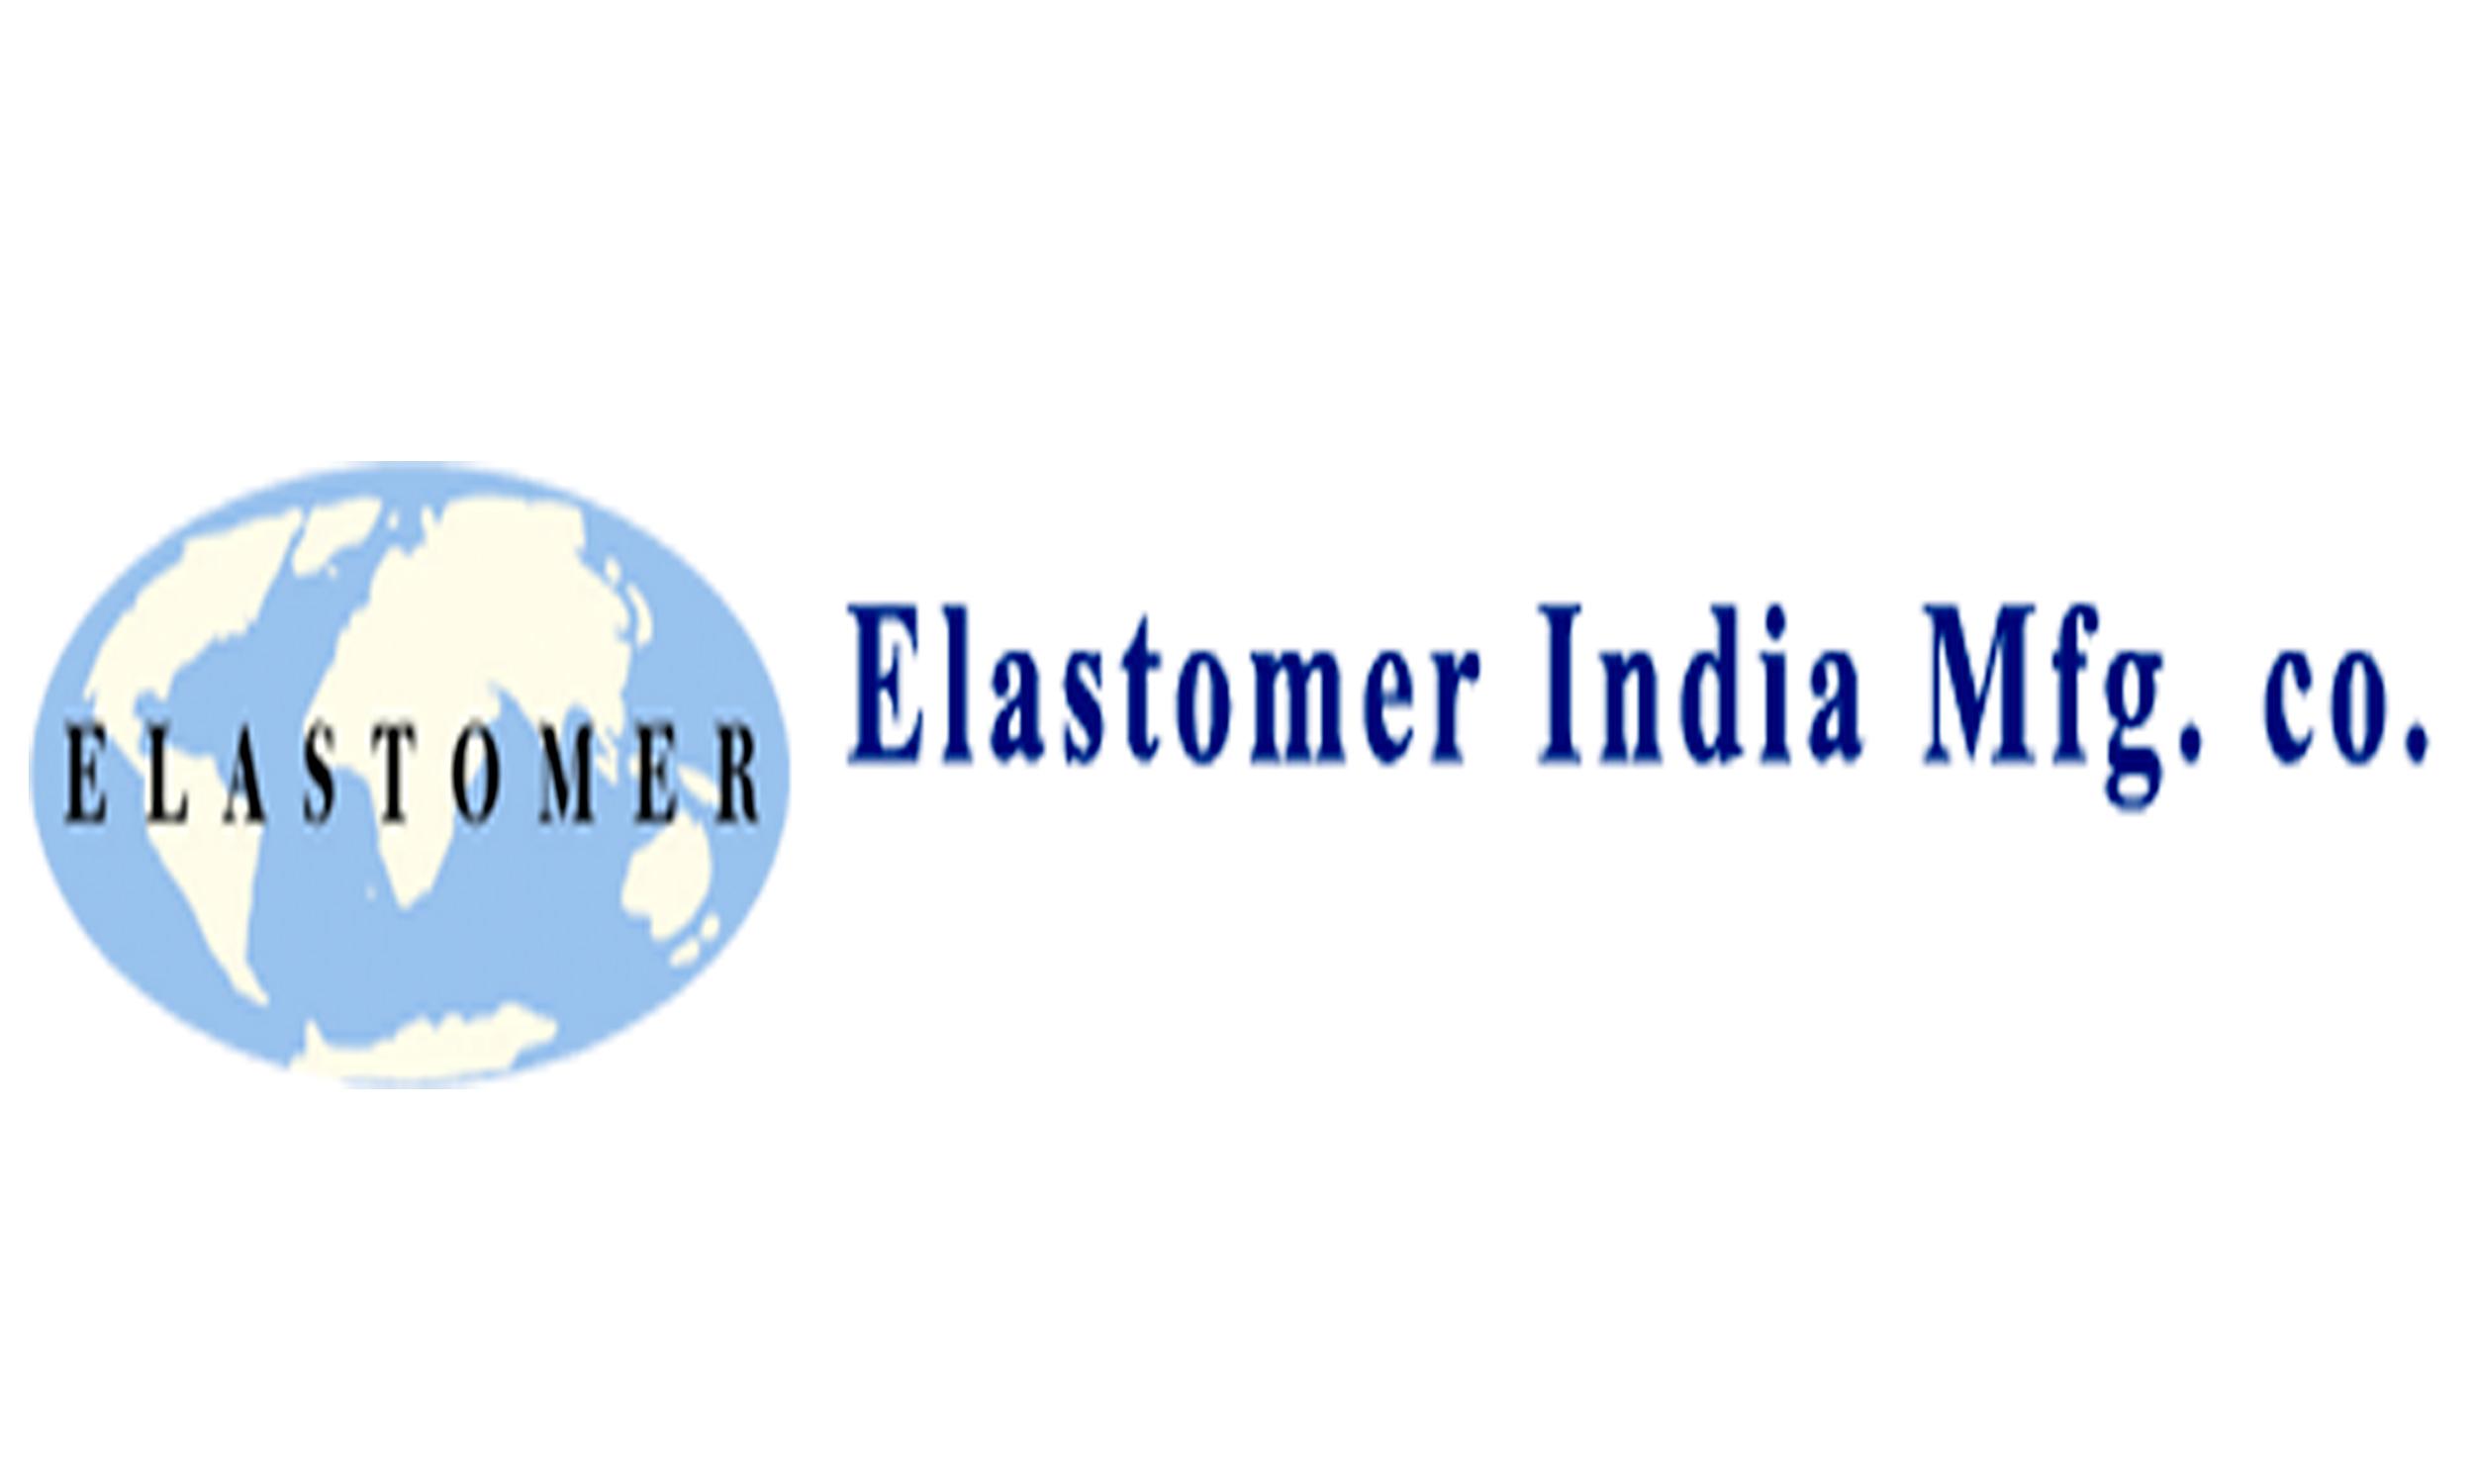 Elastomer India